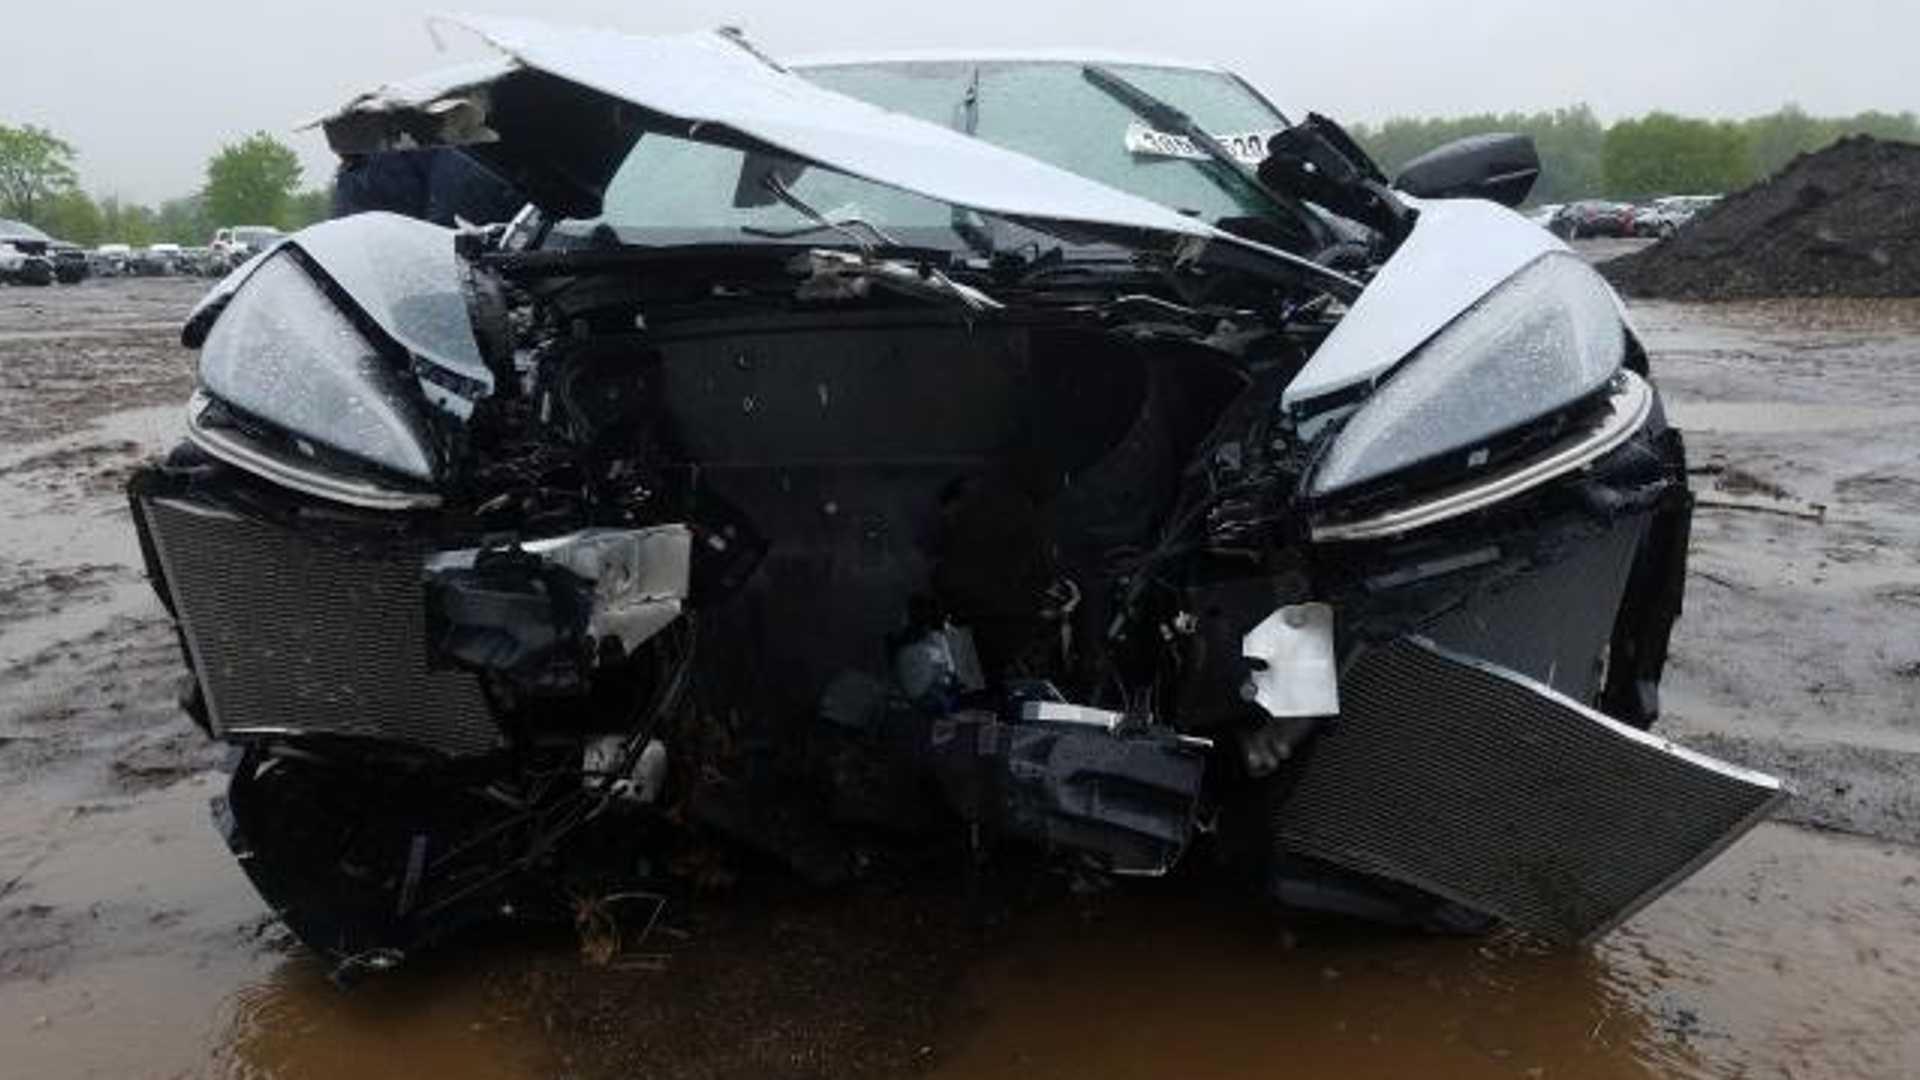 Wrecked C8 Corvette